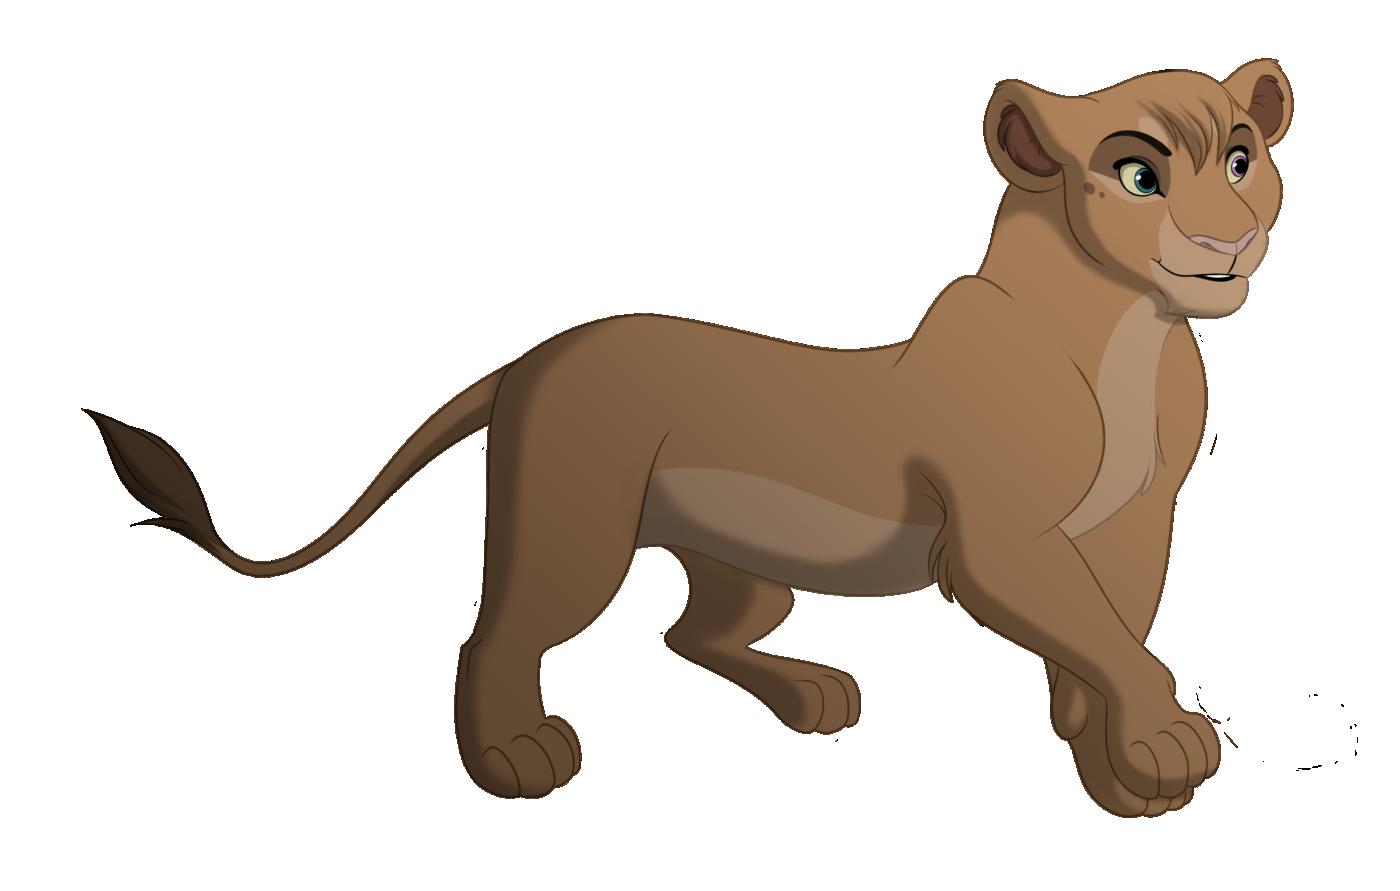 lion cartoon drawings wallpaper - photo #12